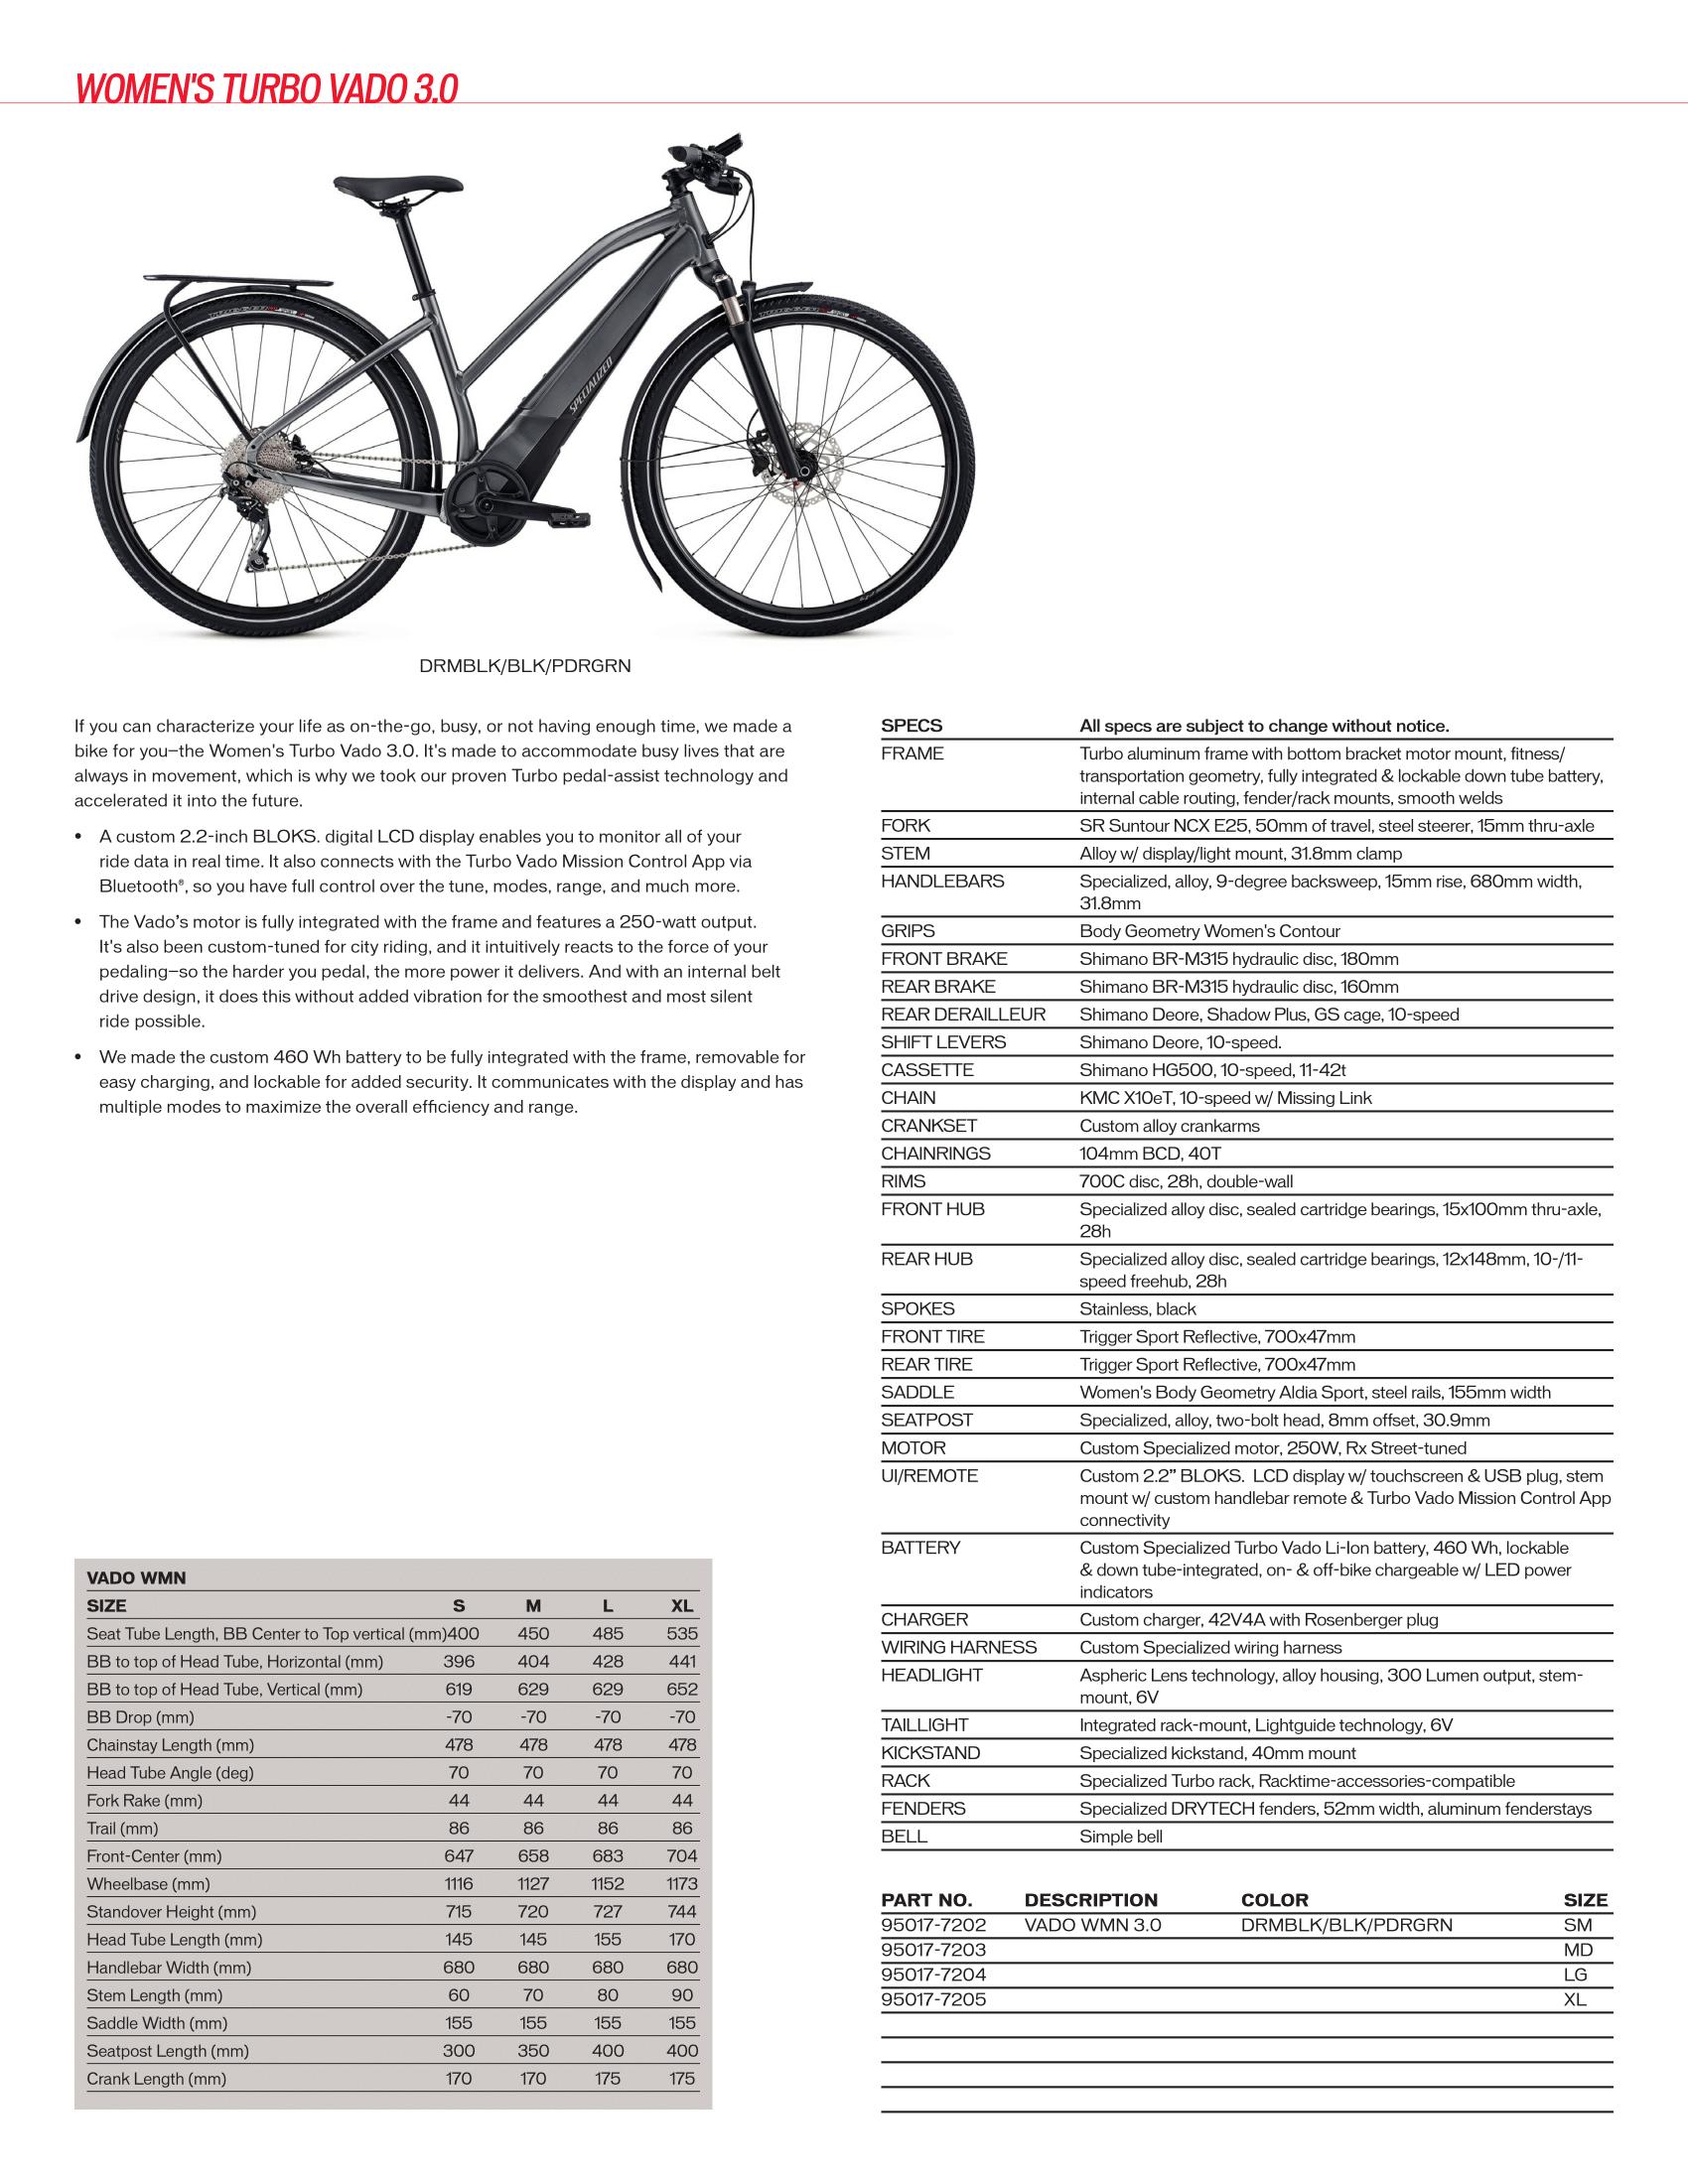 Women's Specialized Turbo Vado 3.0 (E-Bikes)